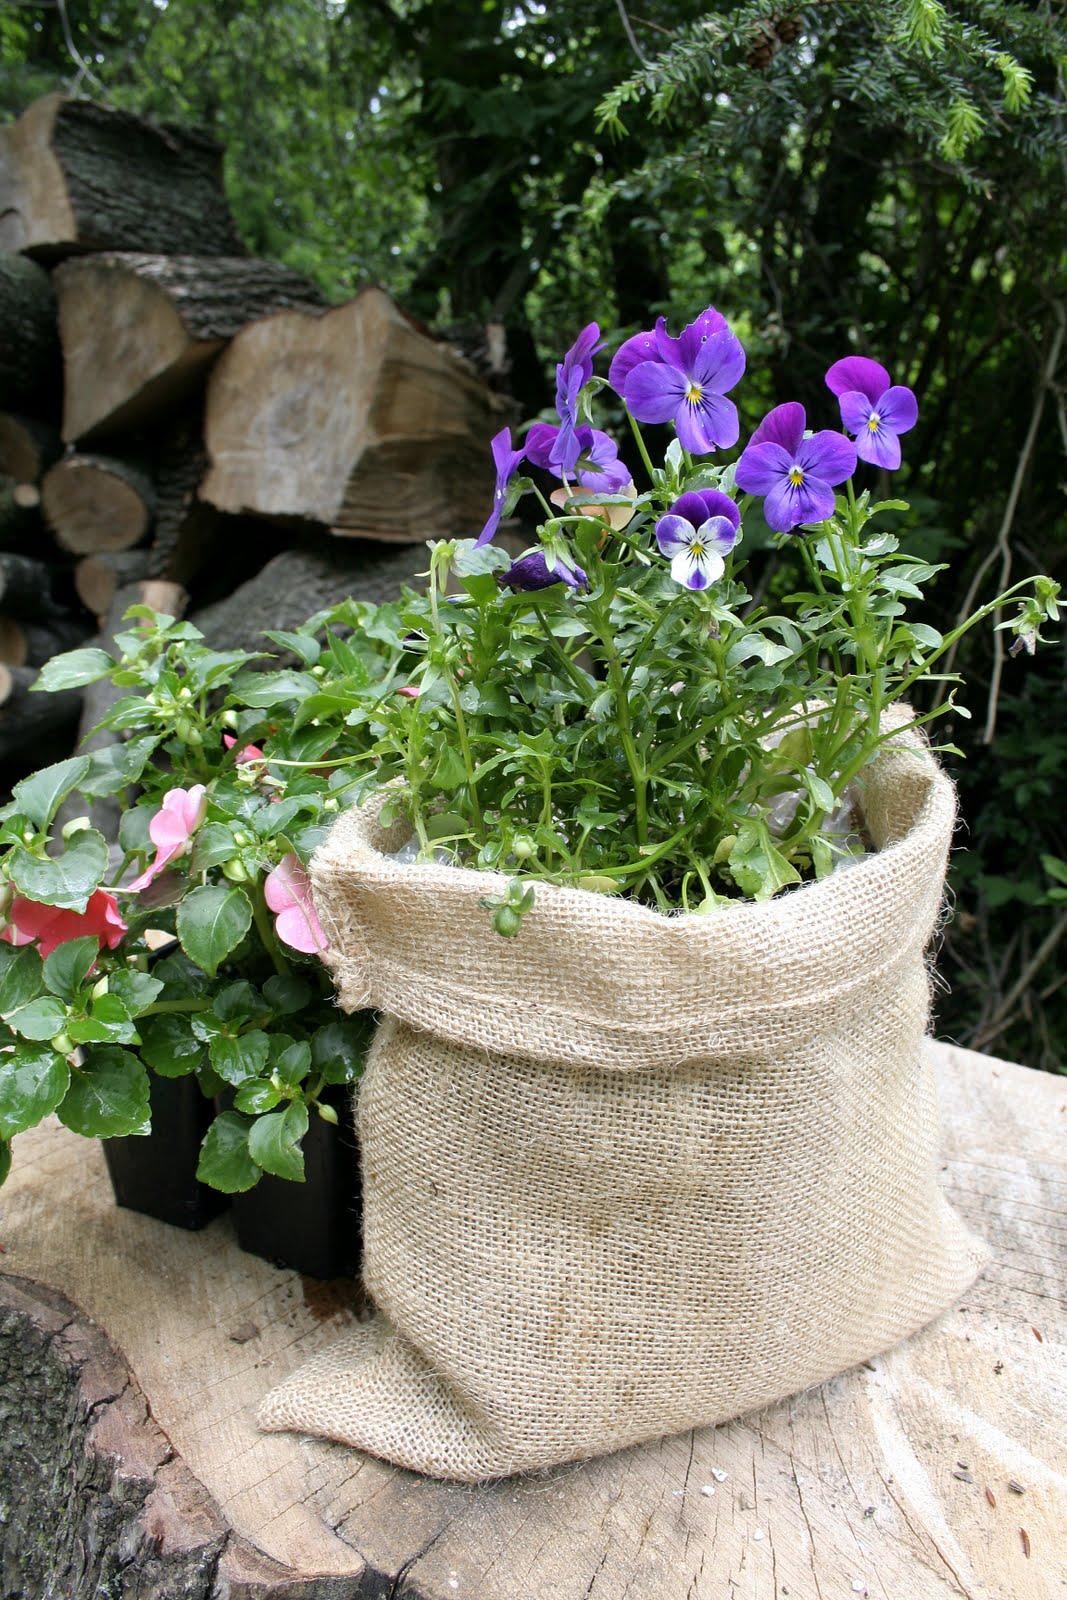 sack_planter 10 Fascinating and Unique Ideas for Portable Gardens